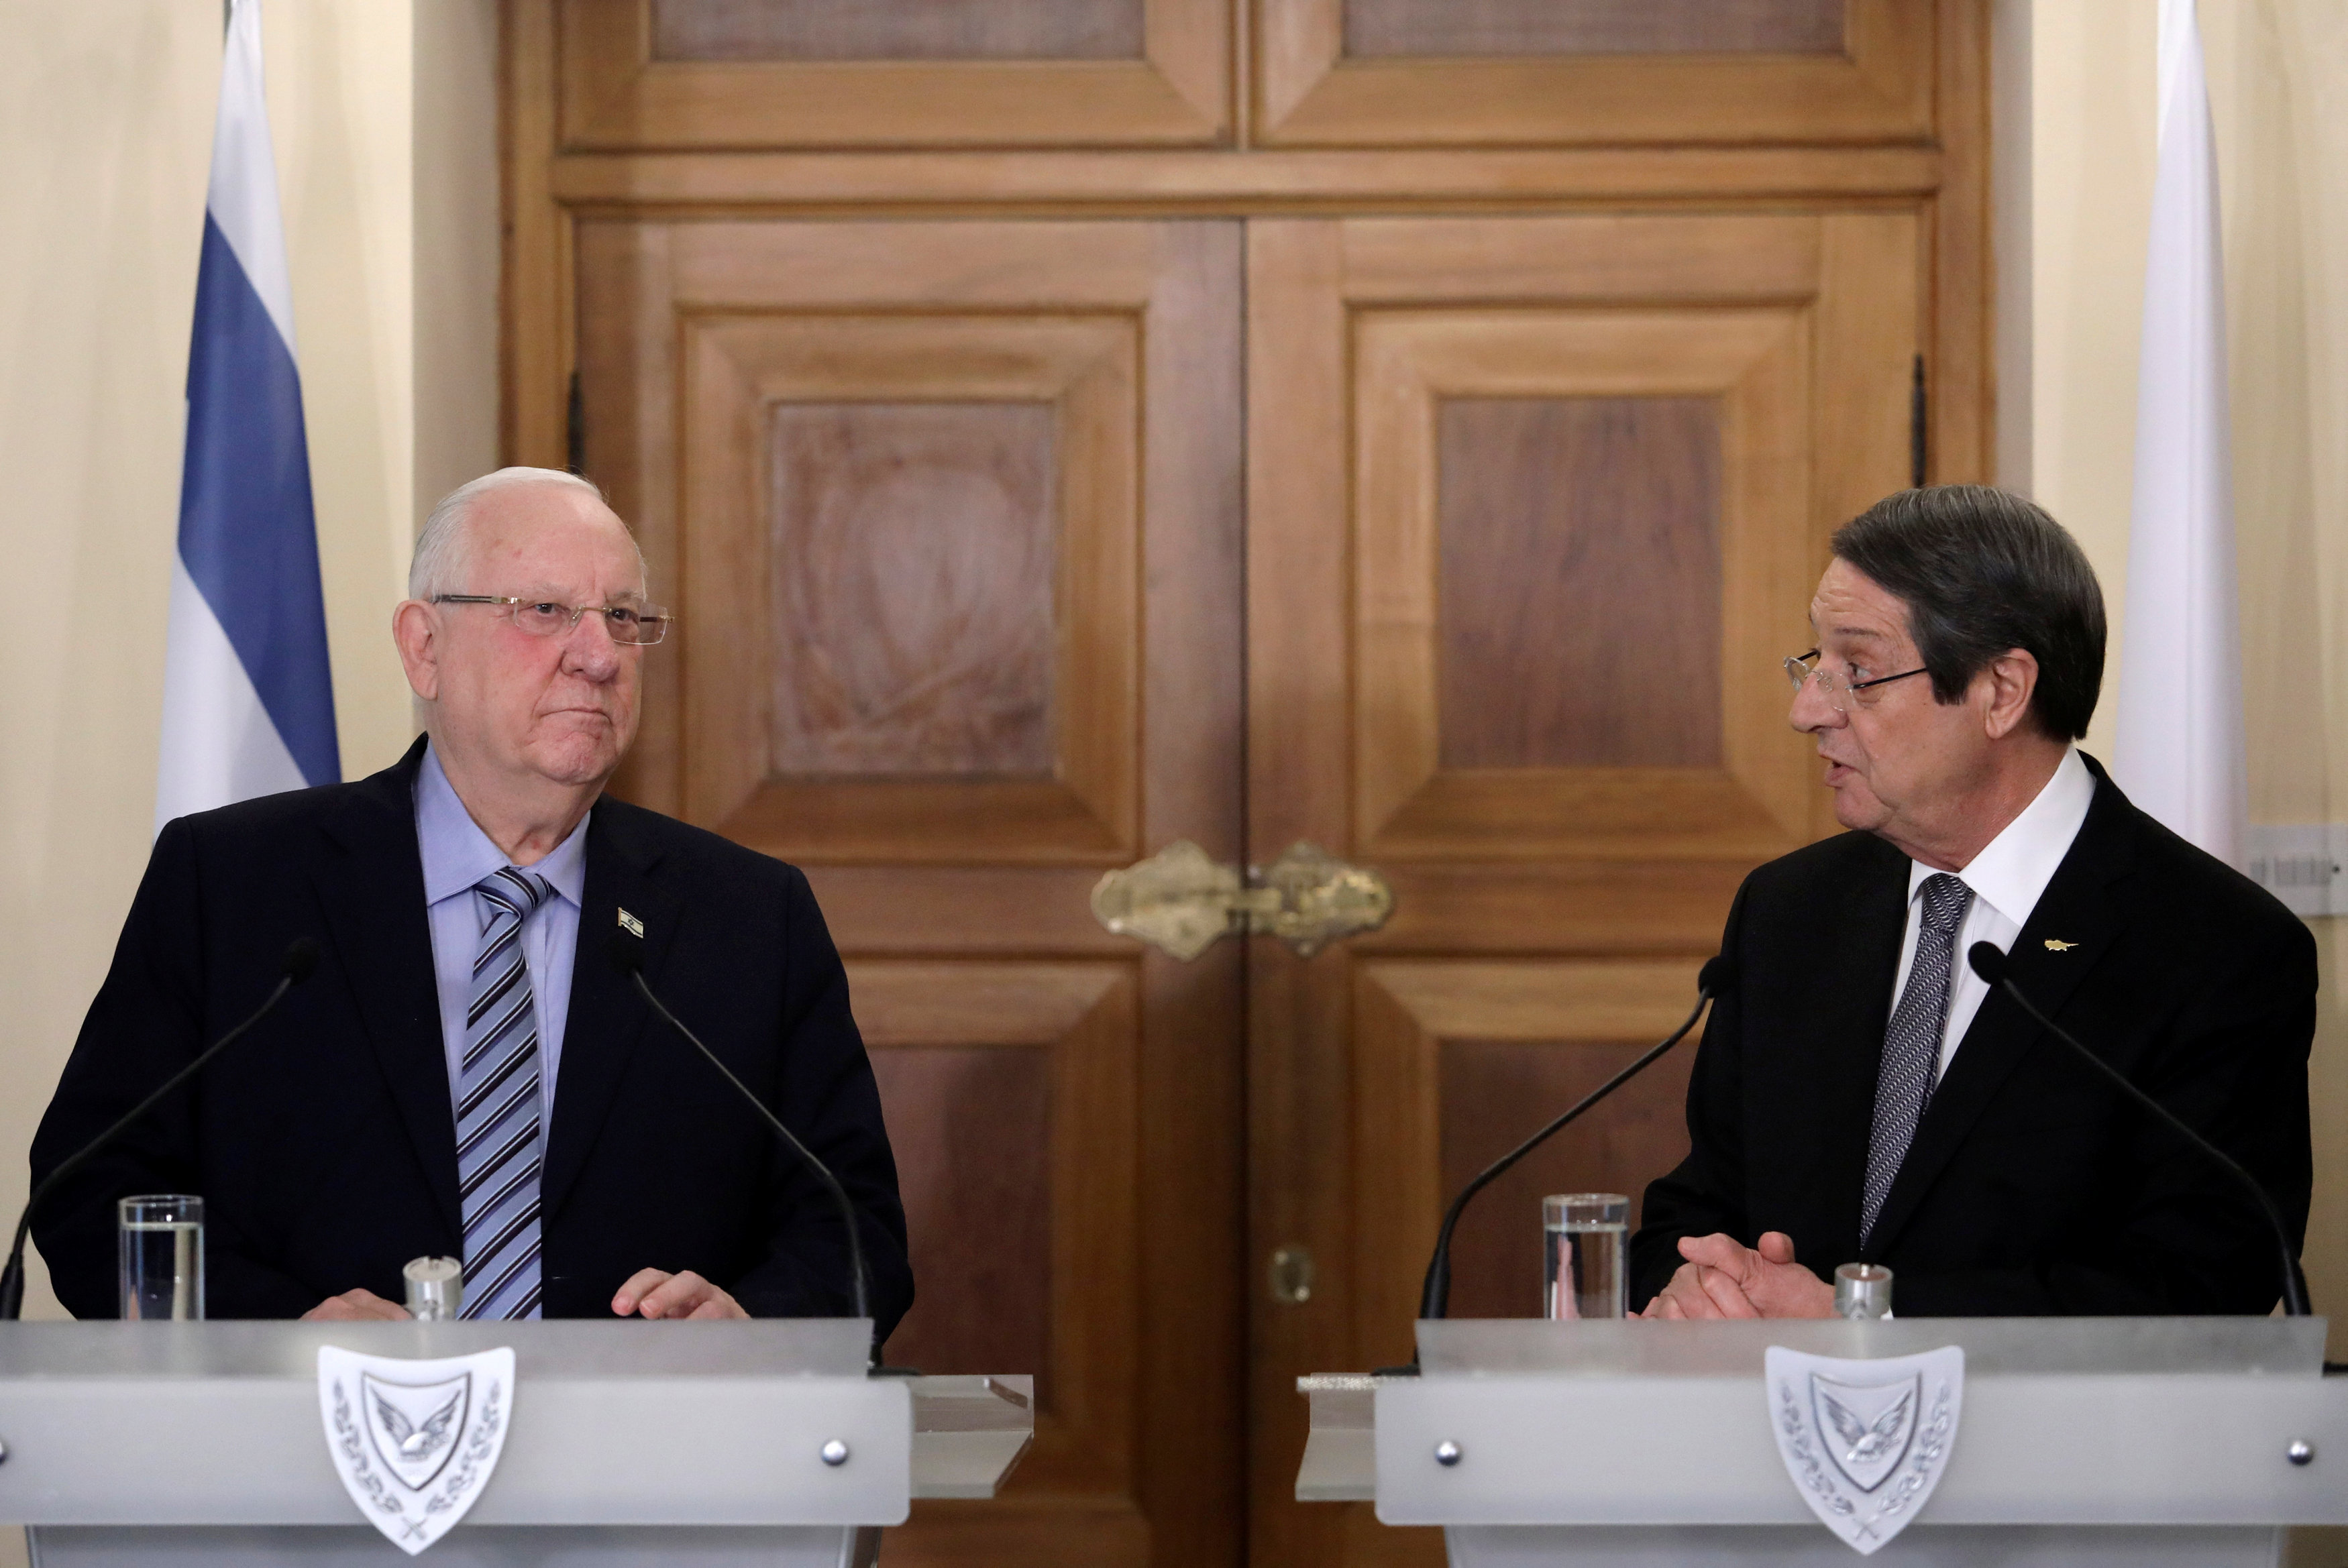 Anastasiades met with the President of Israel